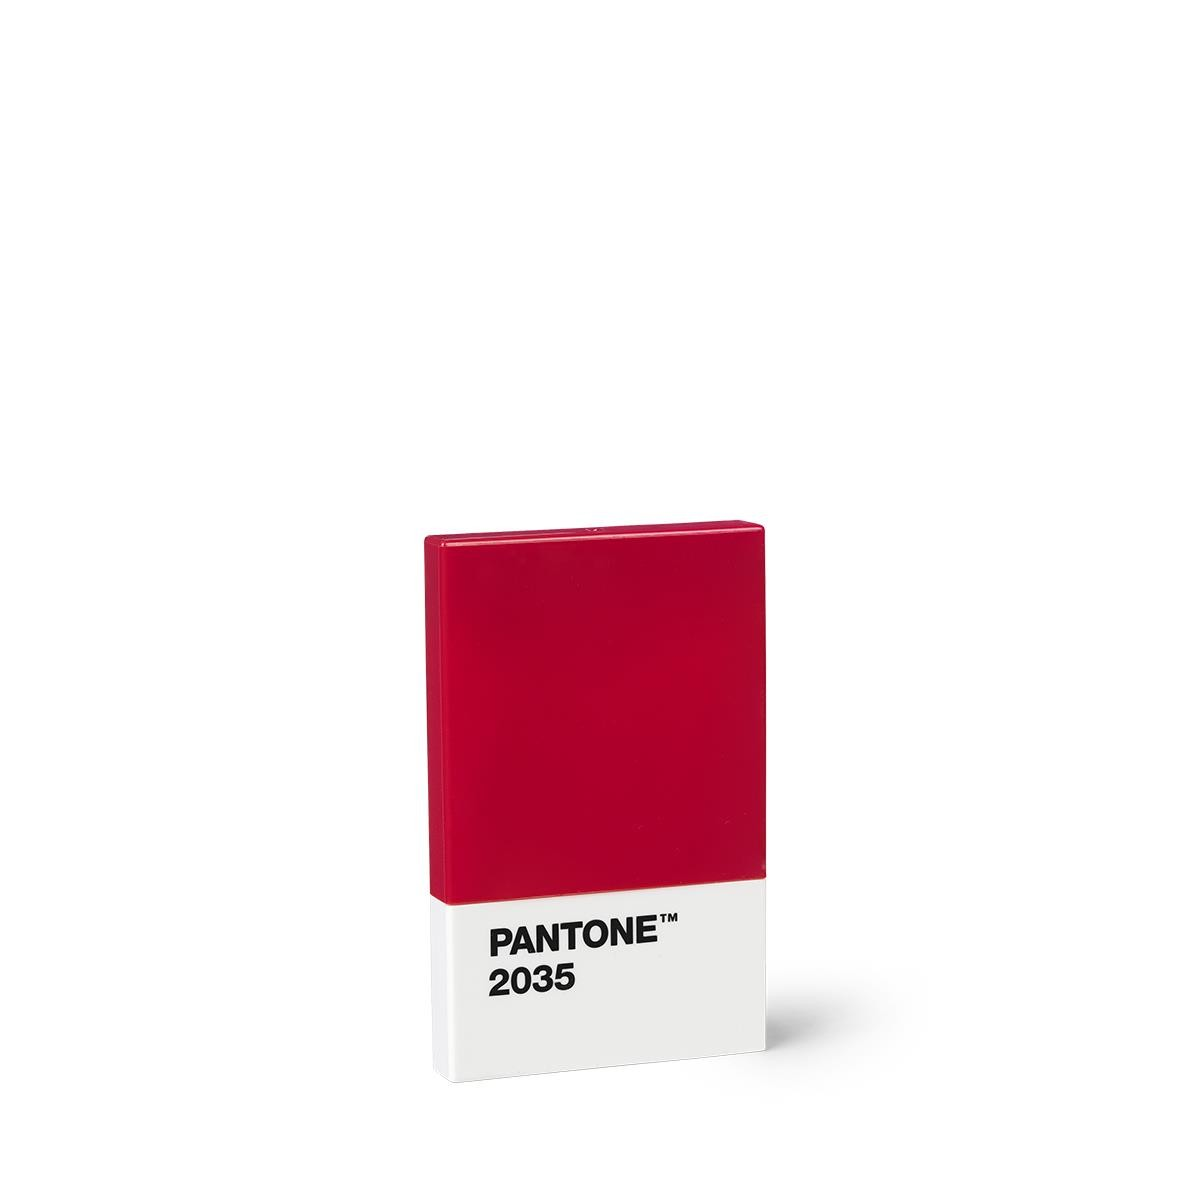 Kreditkarte Visitenkartenetui Rot 2035 Set Von 10 Stück Pantone Büro Produkte